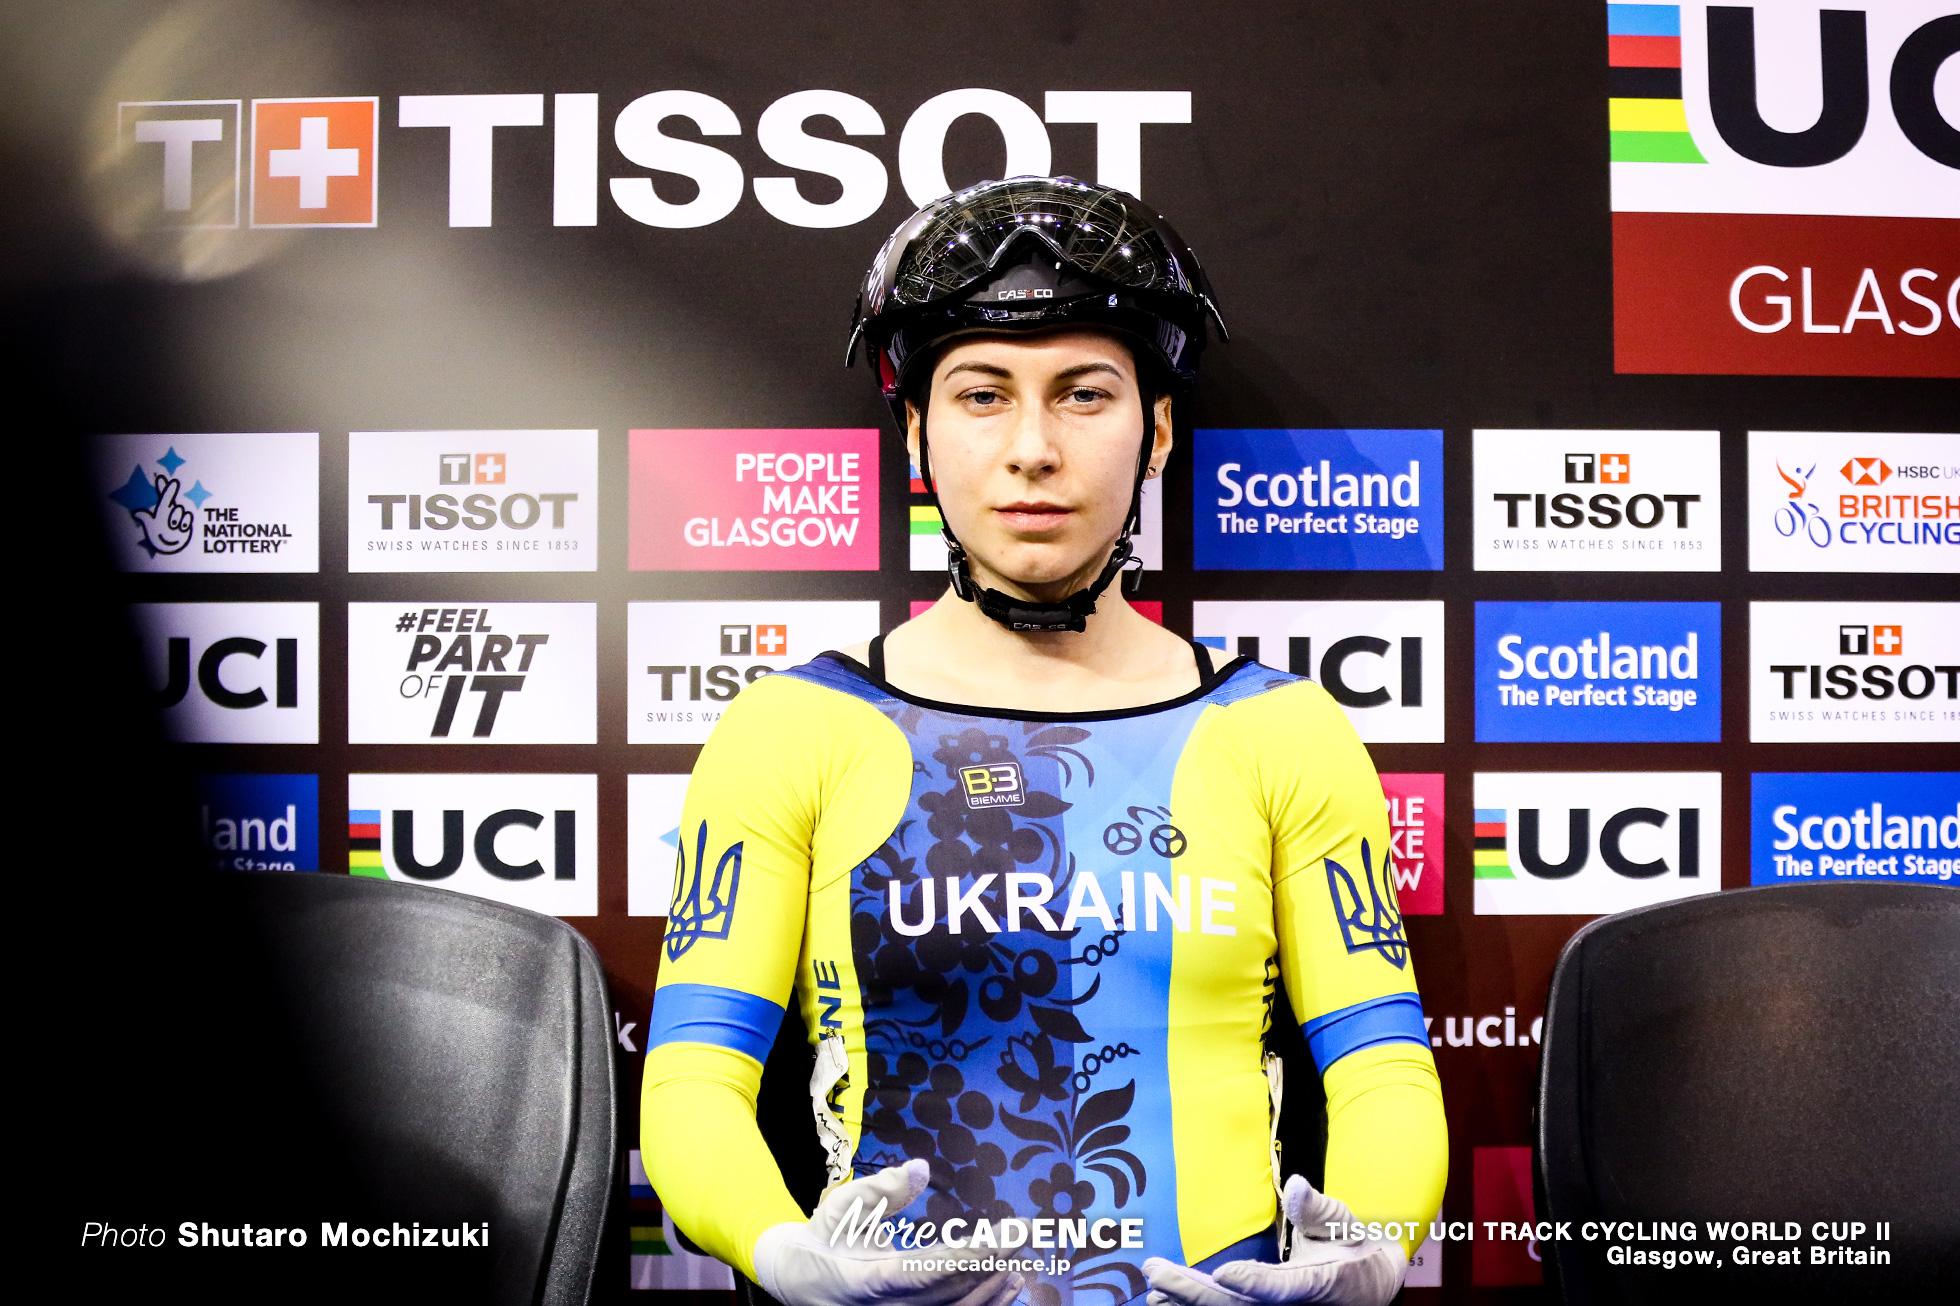 Final / Women's Sprint / TISSOT UCI TRACK CYCLING WORLD CUP II, Glasgow, Great Britain, Olena STARIKOVA オレナ・スタリコワ